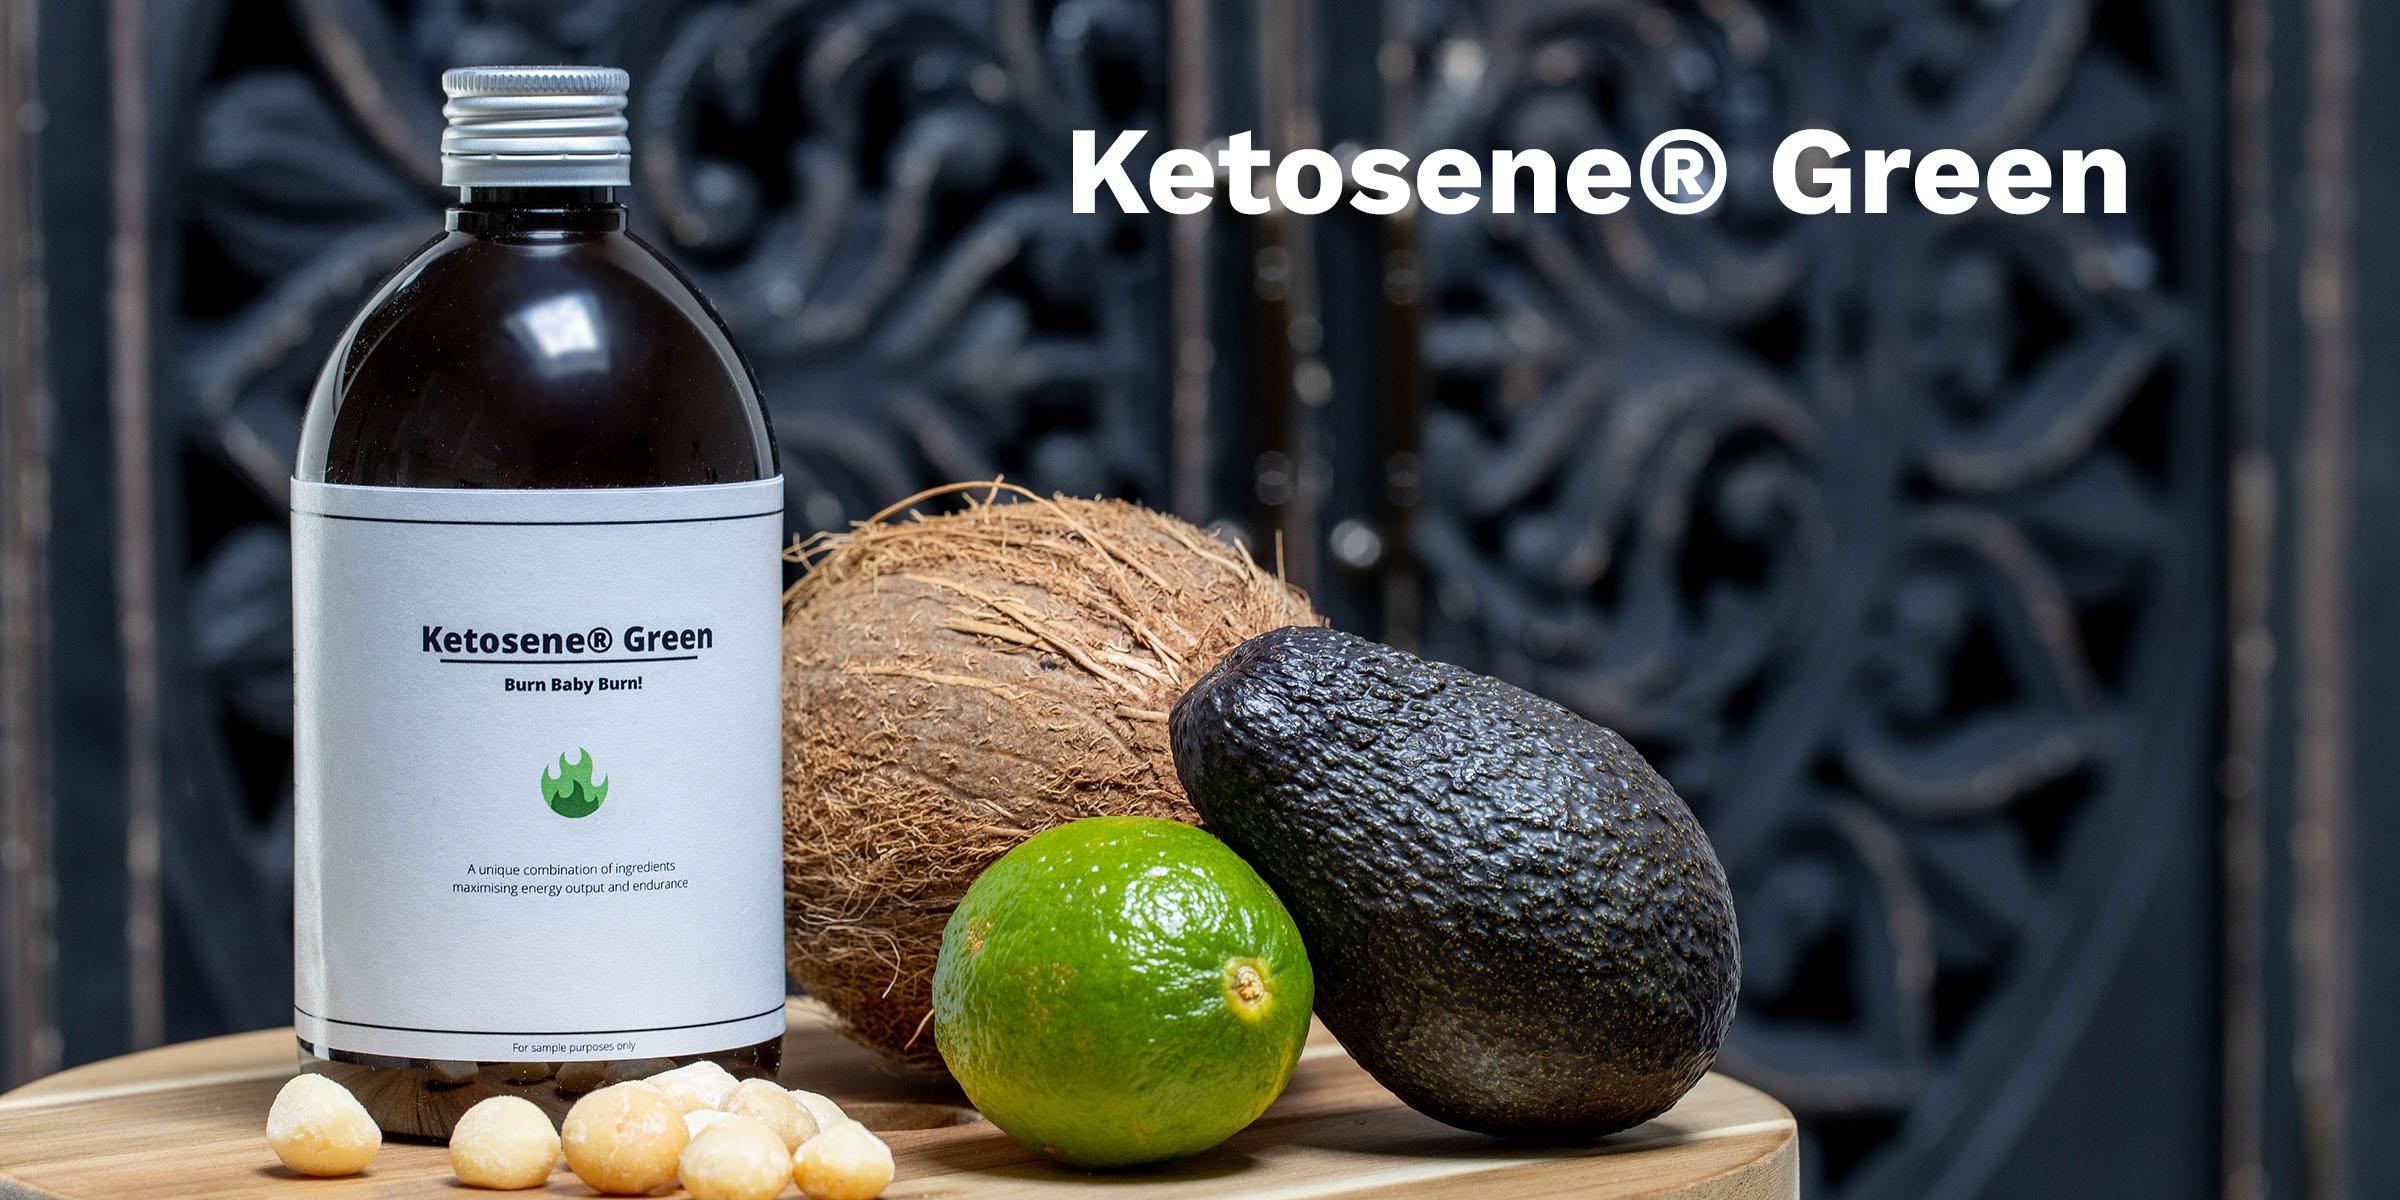 Ketosene Green